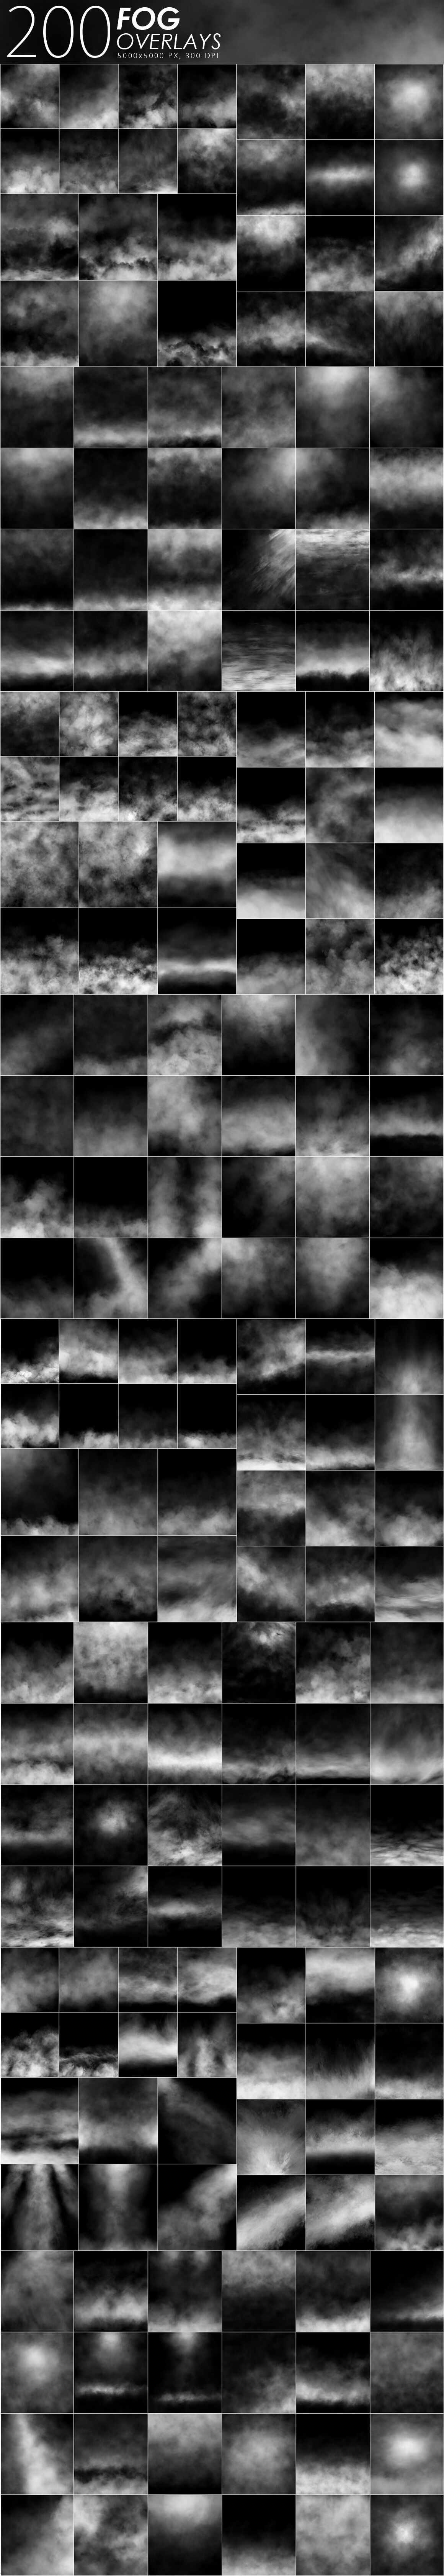 1500+ VFX Overlays Bundle By ArtistMef | TheHungryJPEG com